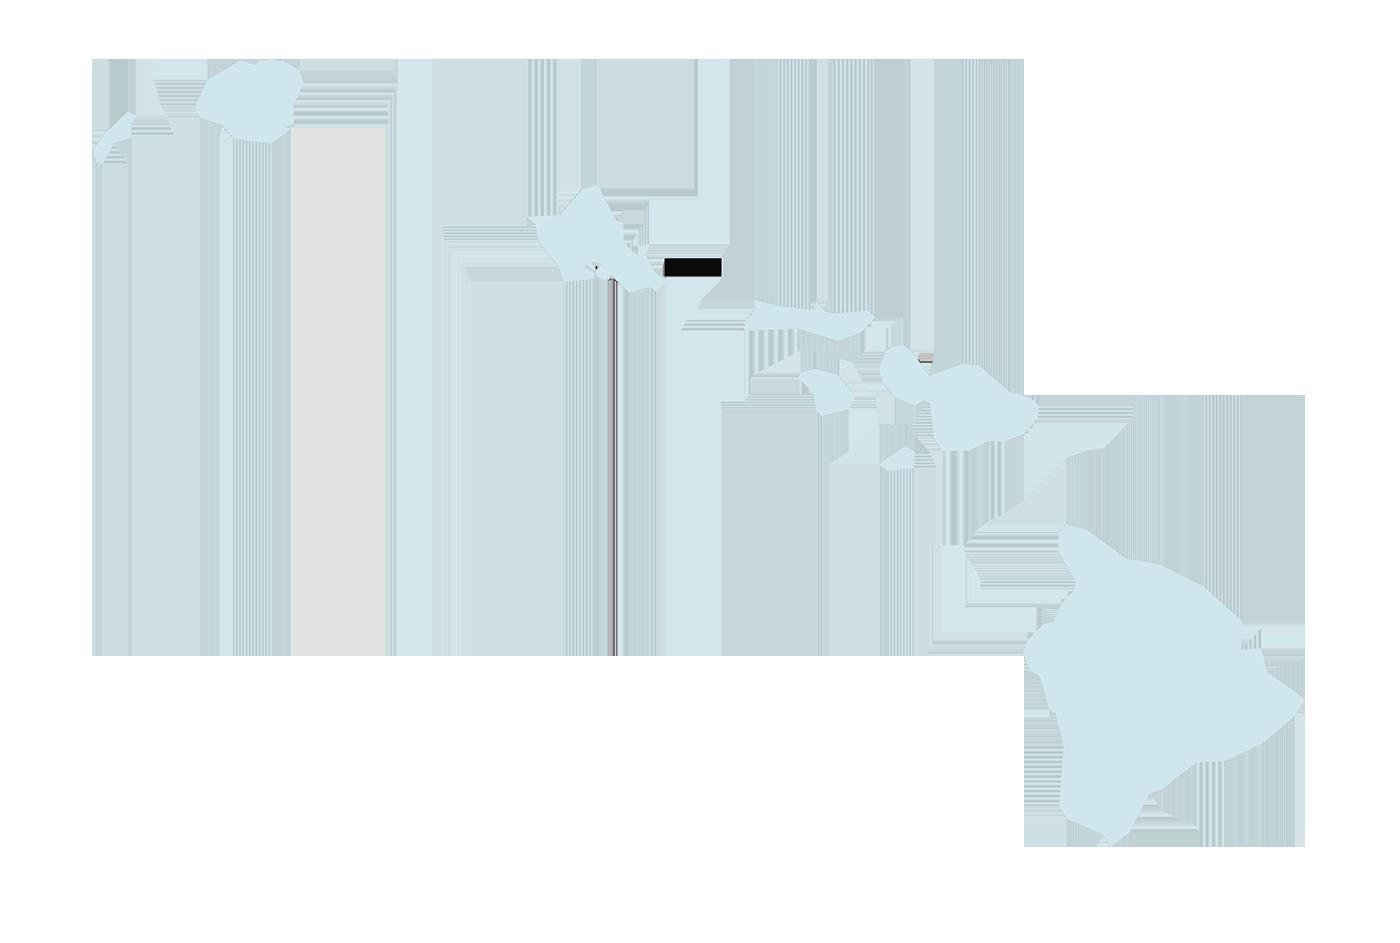 Hawaii Public Health Institiute